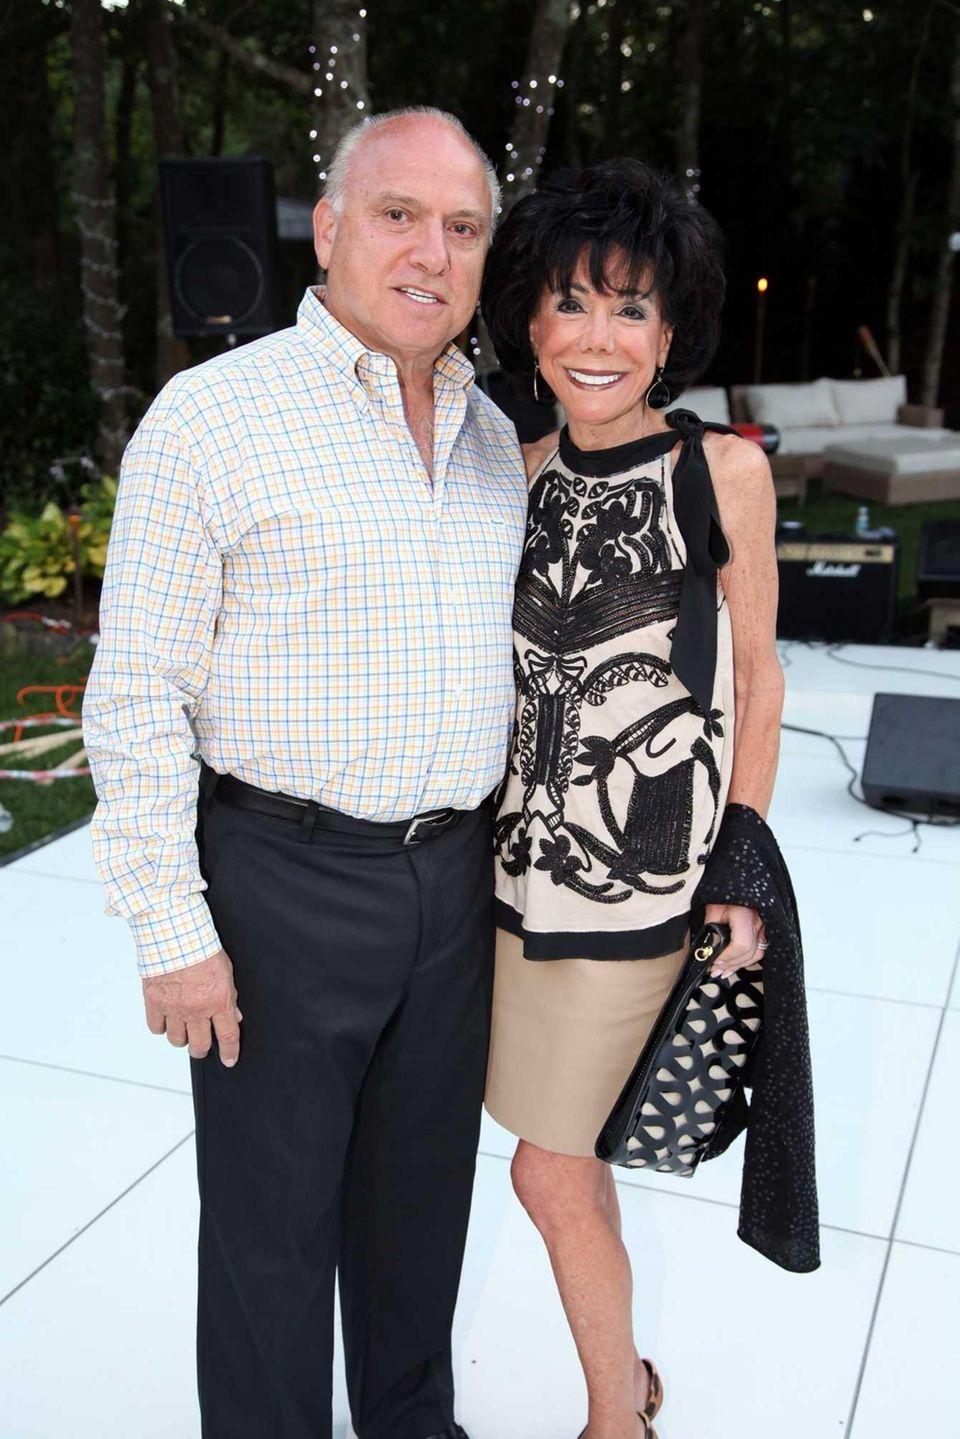 David Feinsod and Carole Feinsod attend the Hamptons